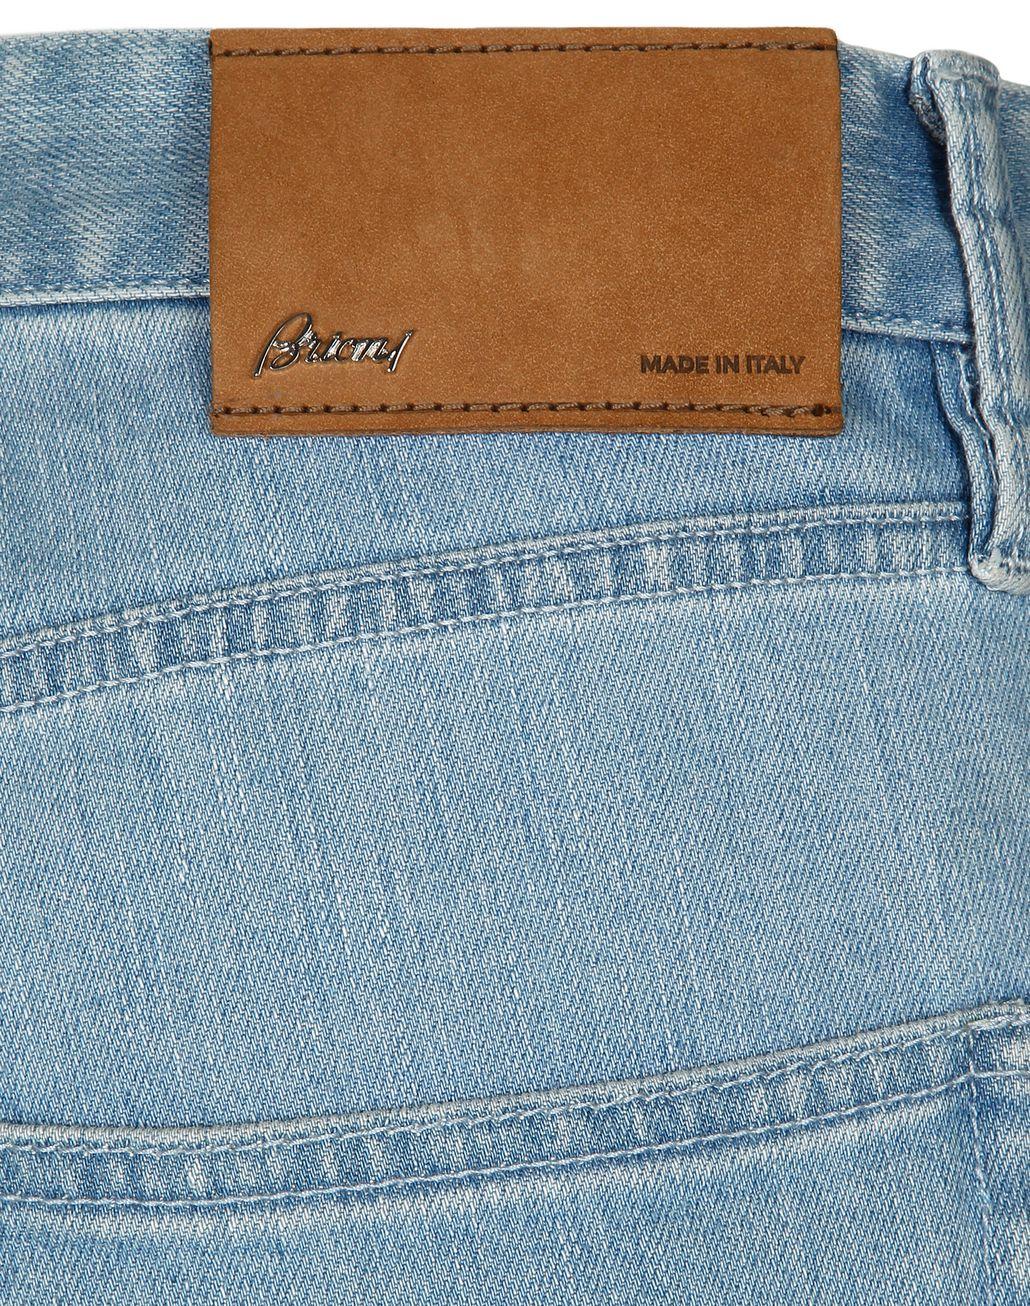 BRIONI Light Blue Denim Trousers Trousers Man a